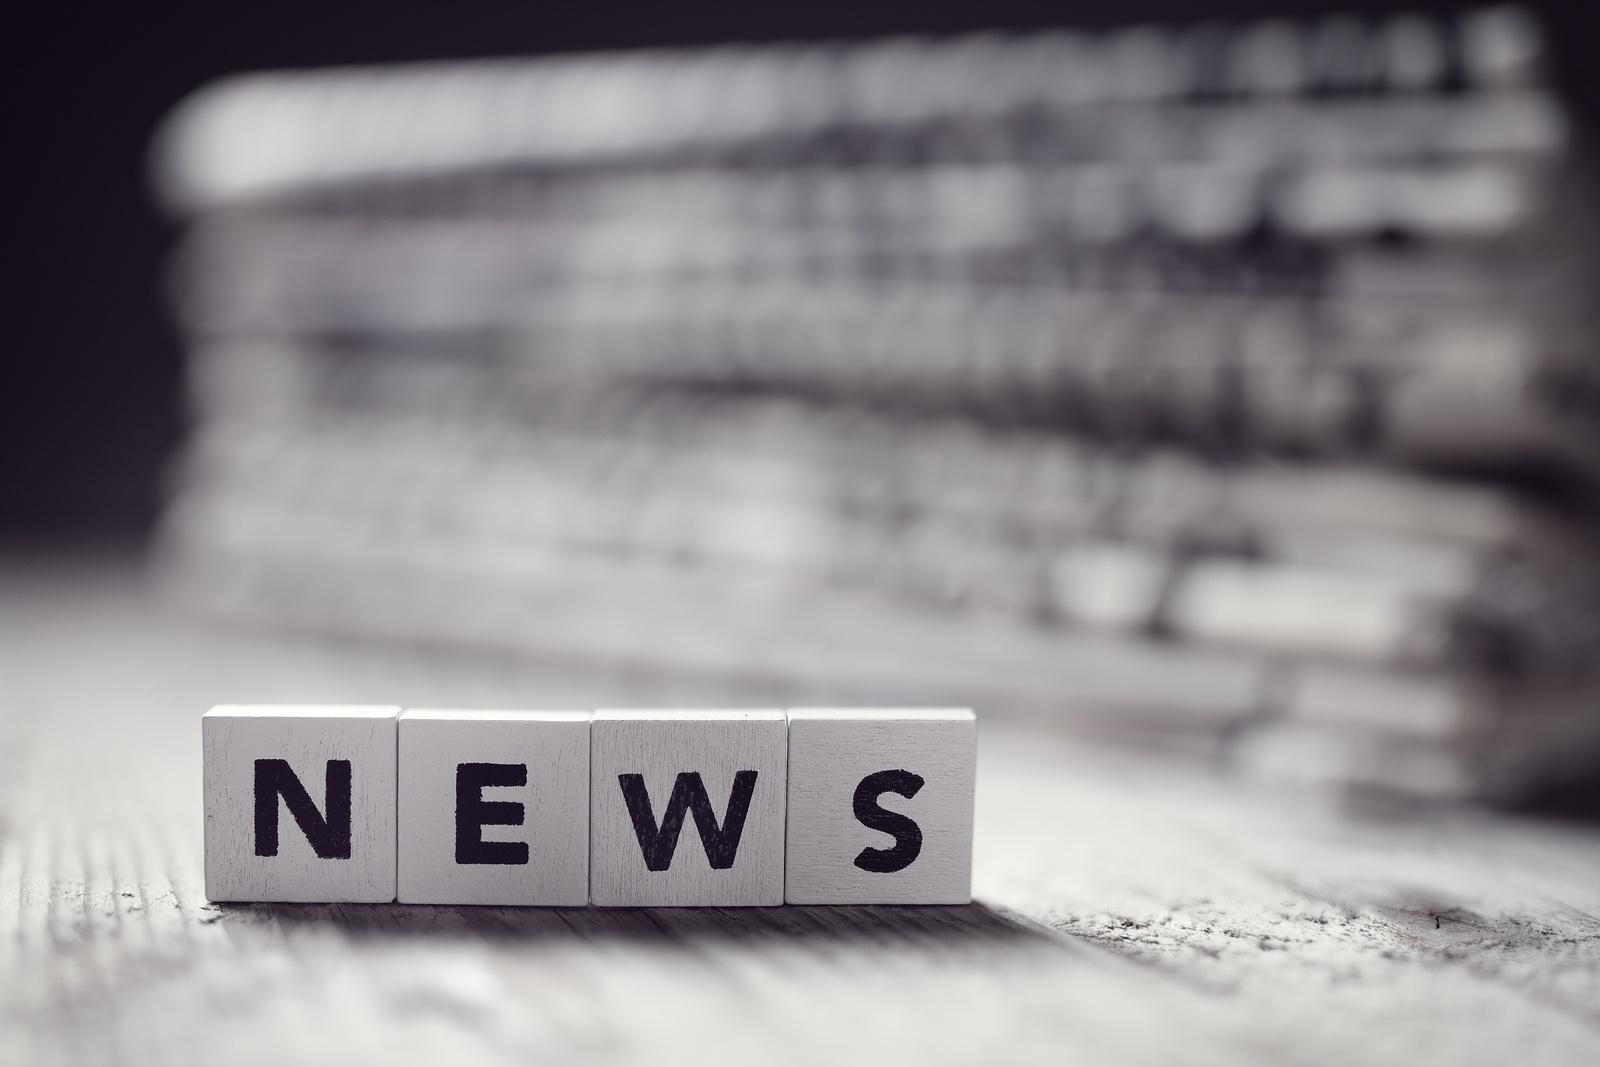 bigstock-News-and-newspaper-headlines-c-178222015